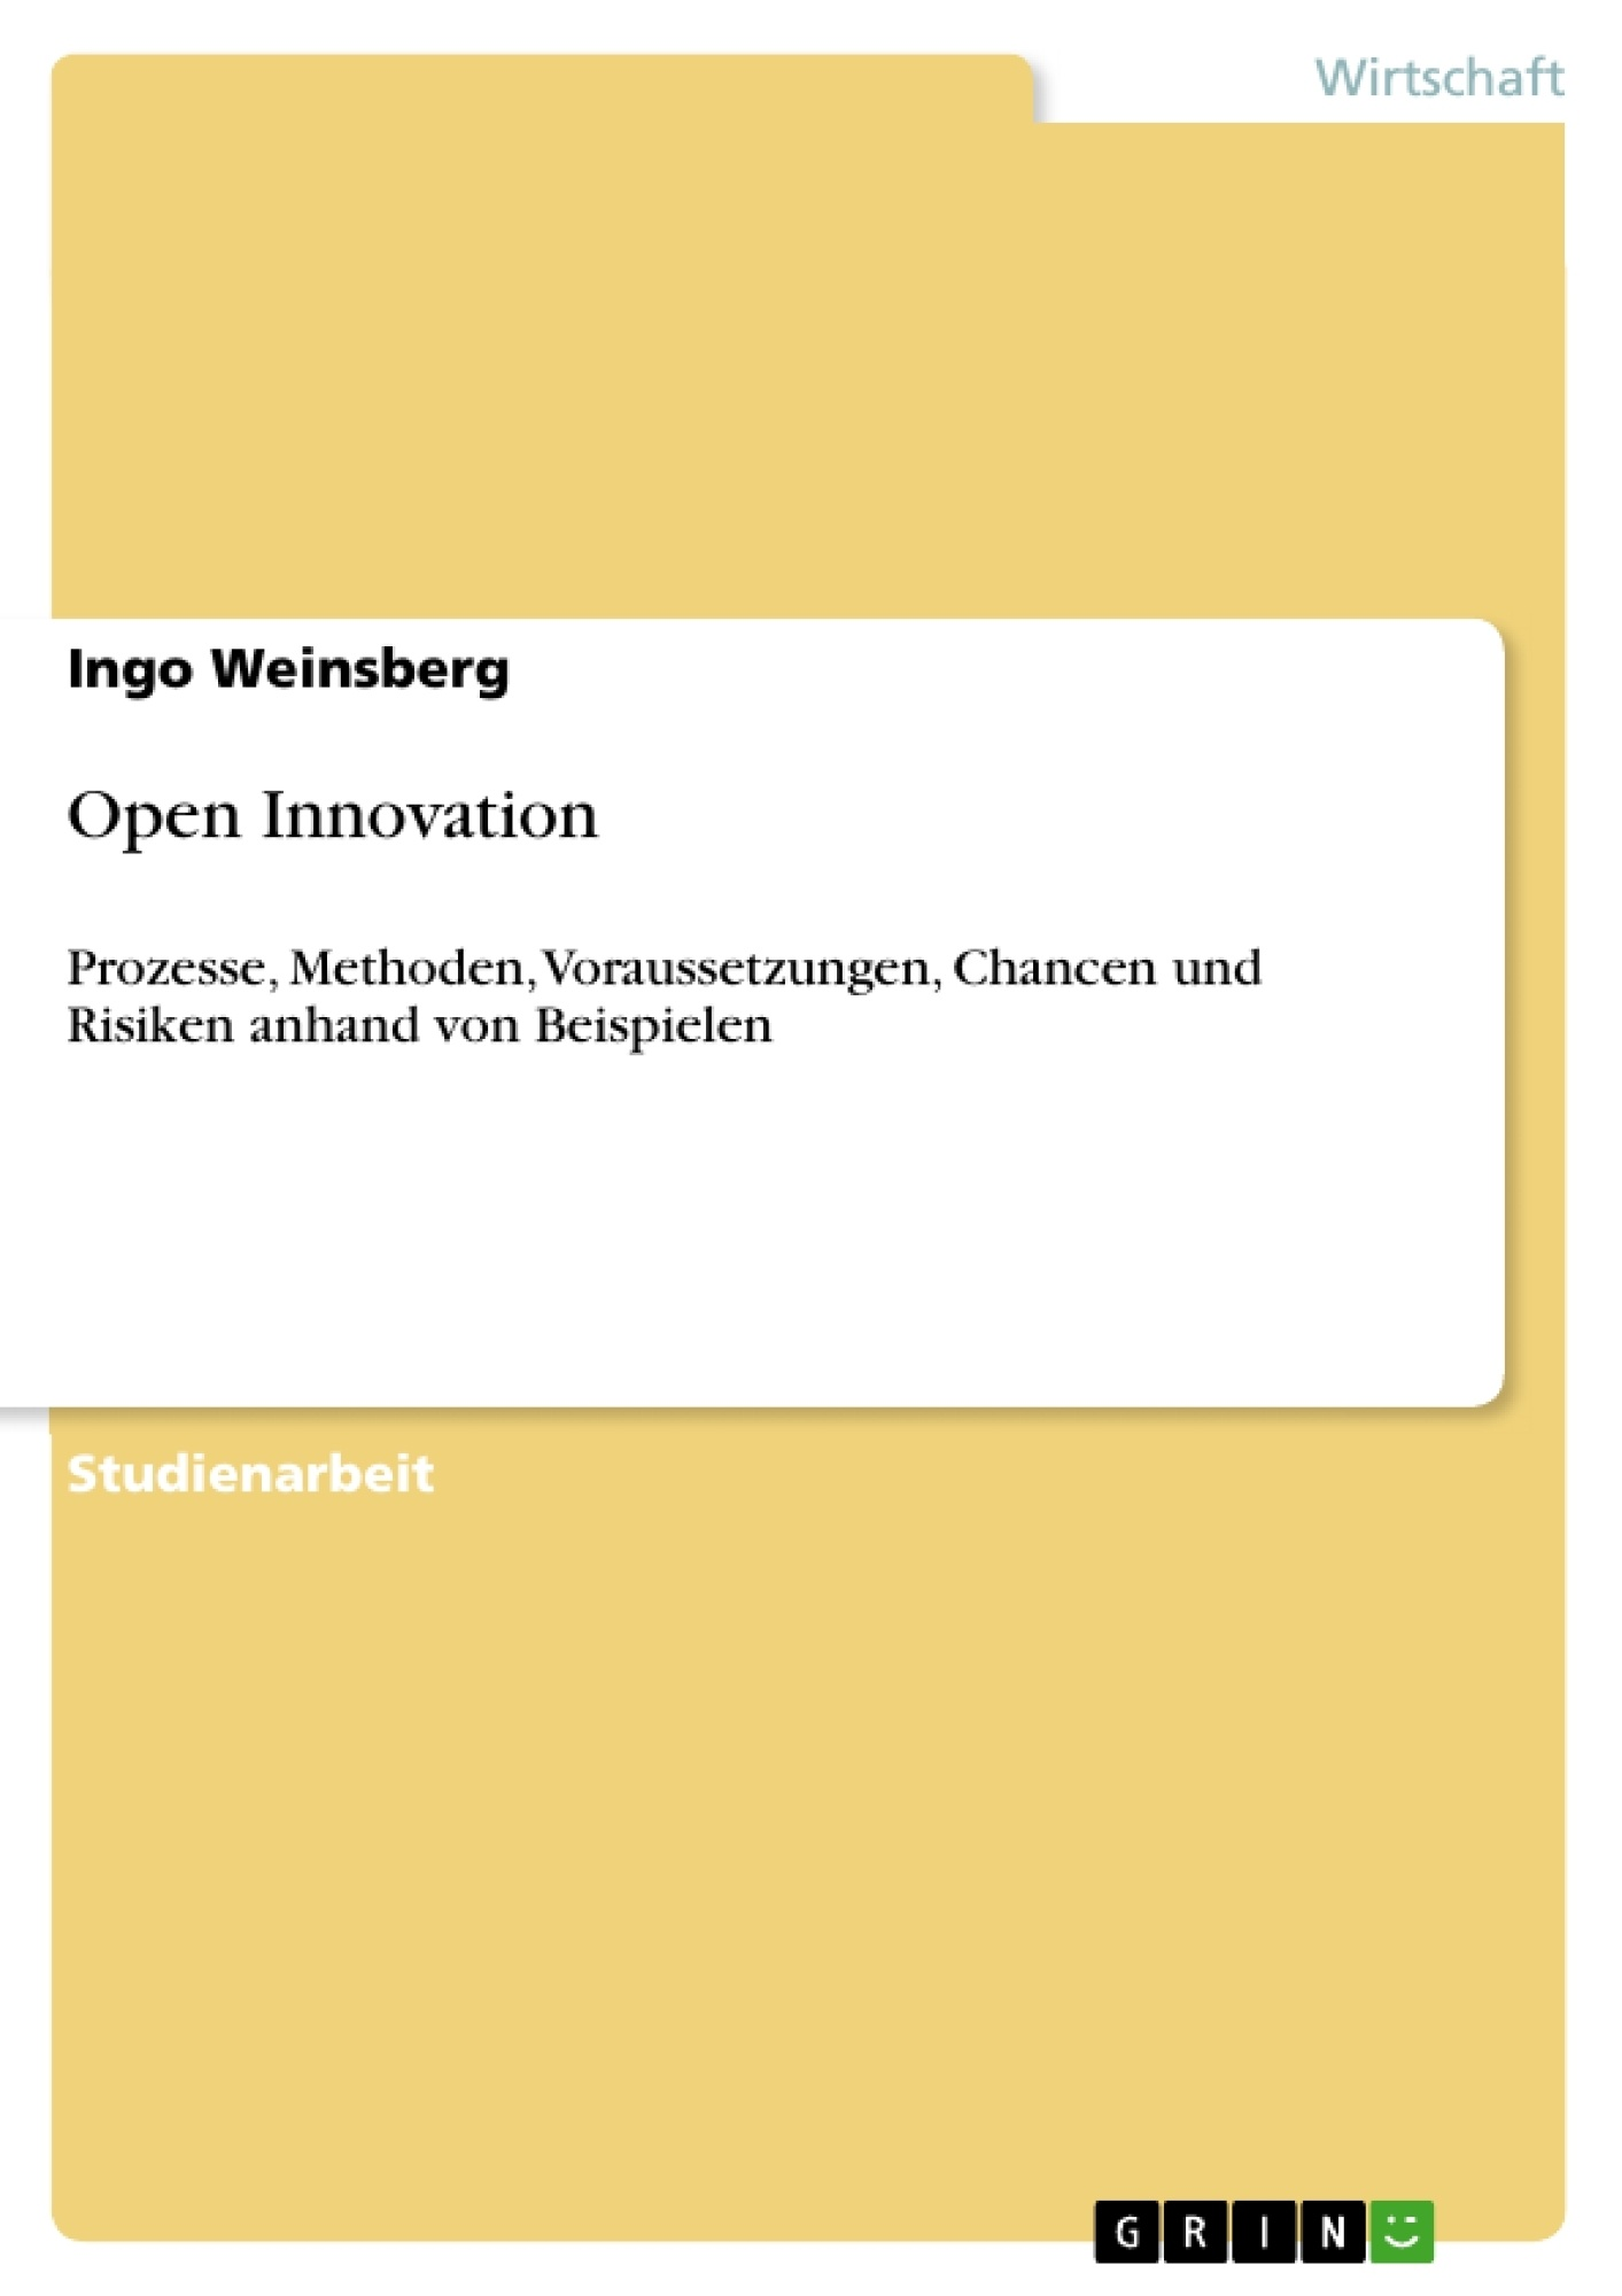 Titel: Open Innovation